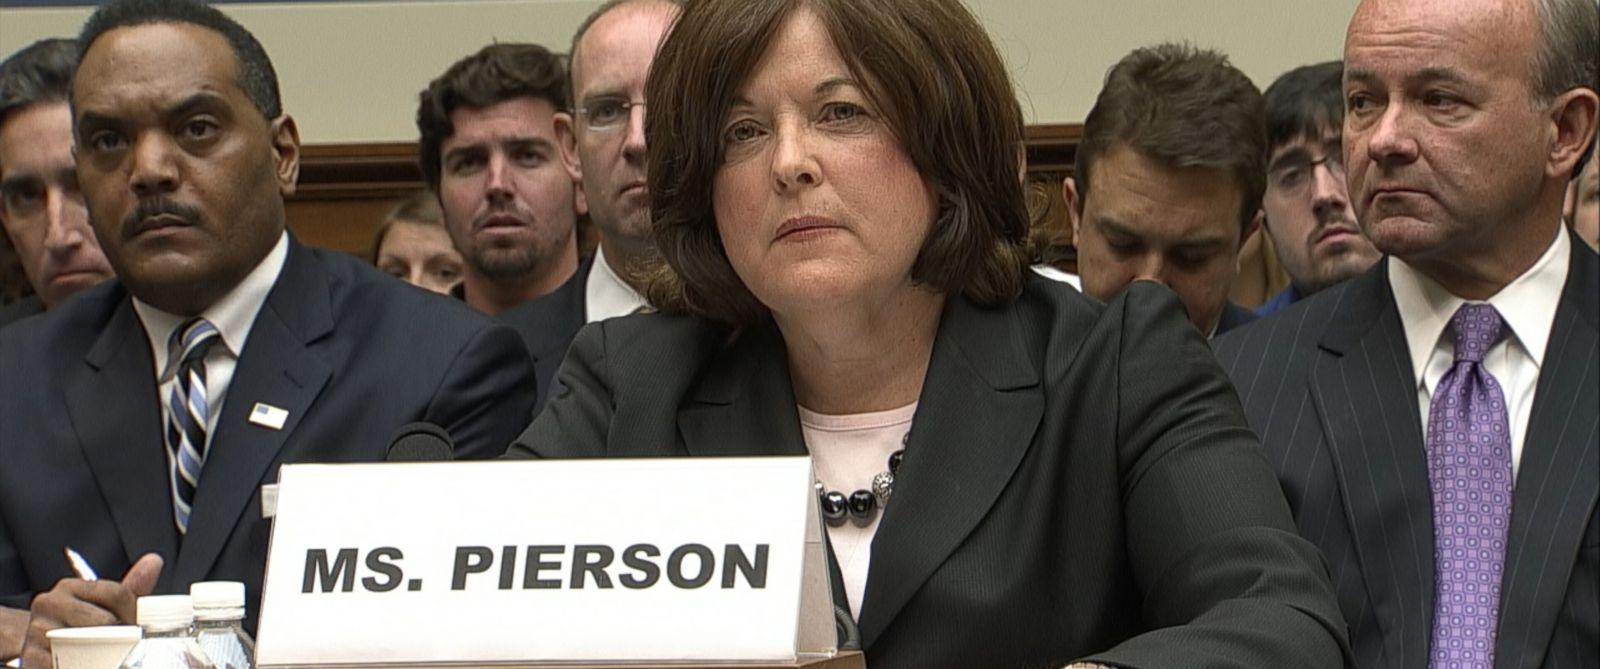 PHOTO: Julia Pierson, the Secret Service Director, testifies before Congress, Sept. 30, 2014.